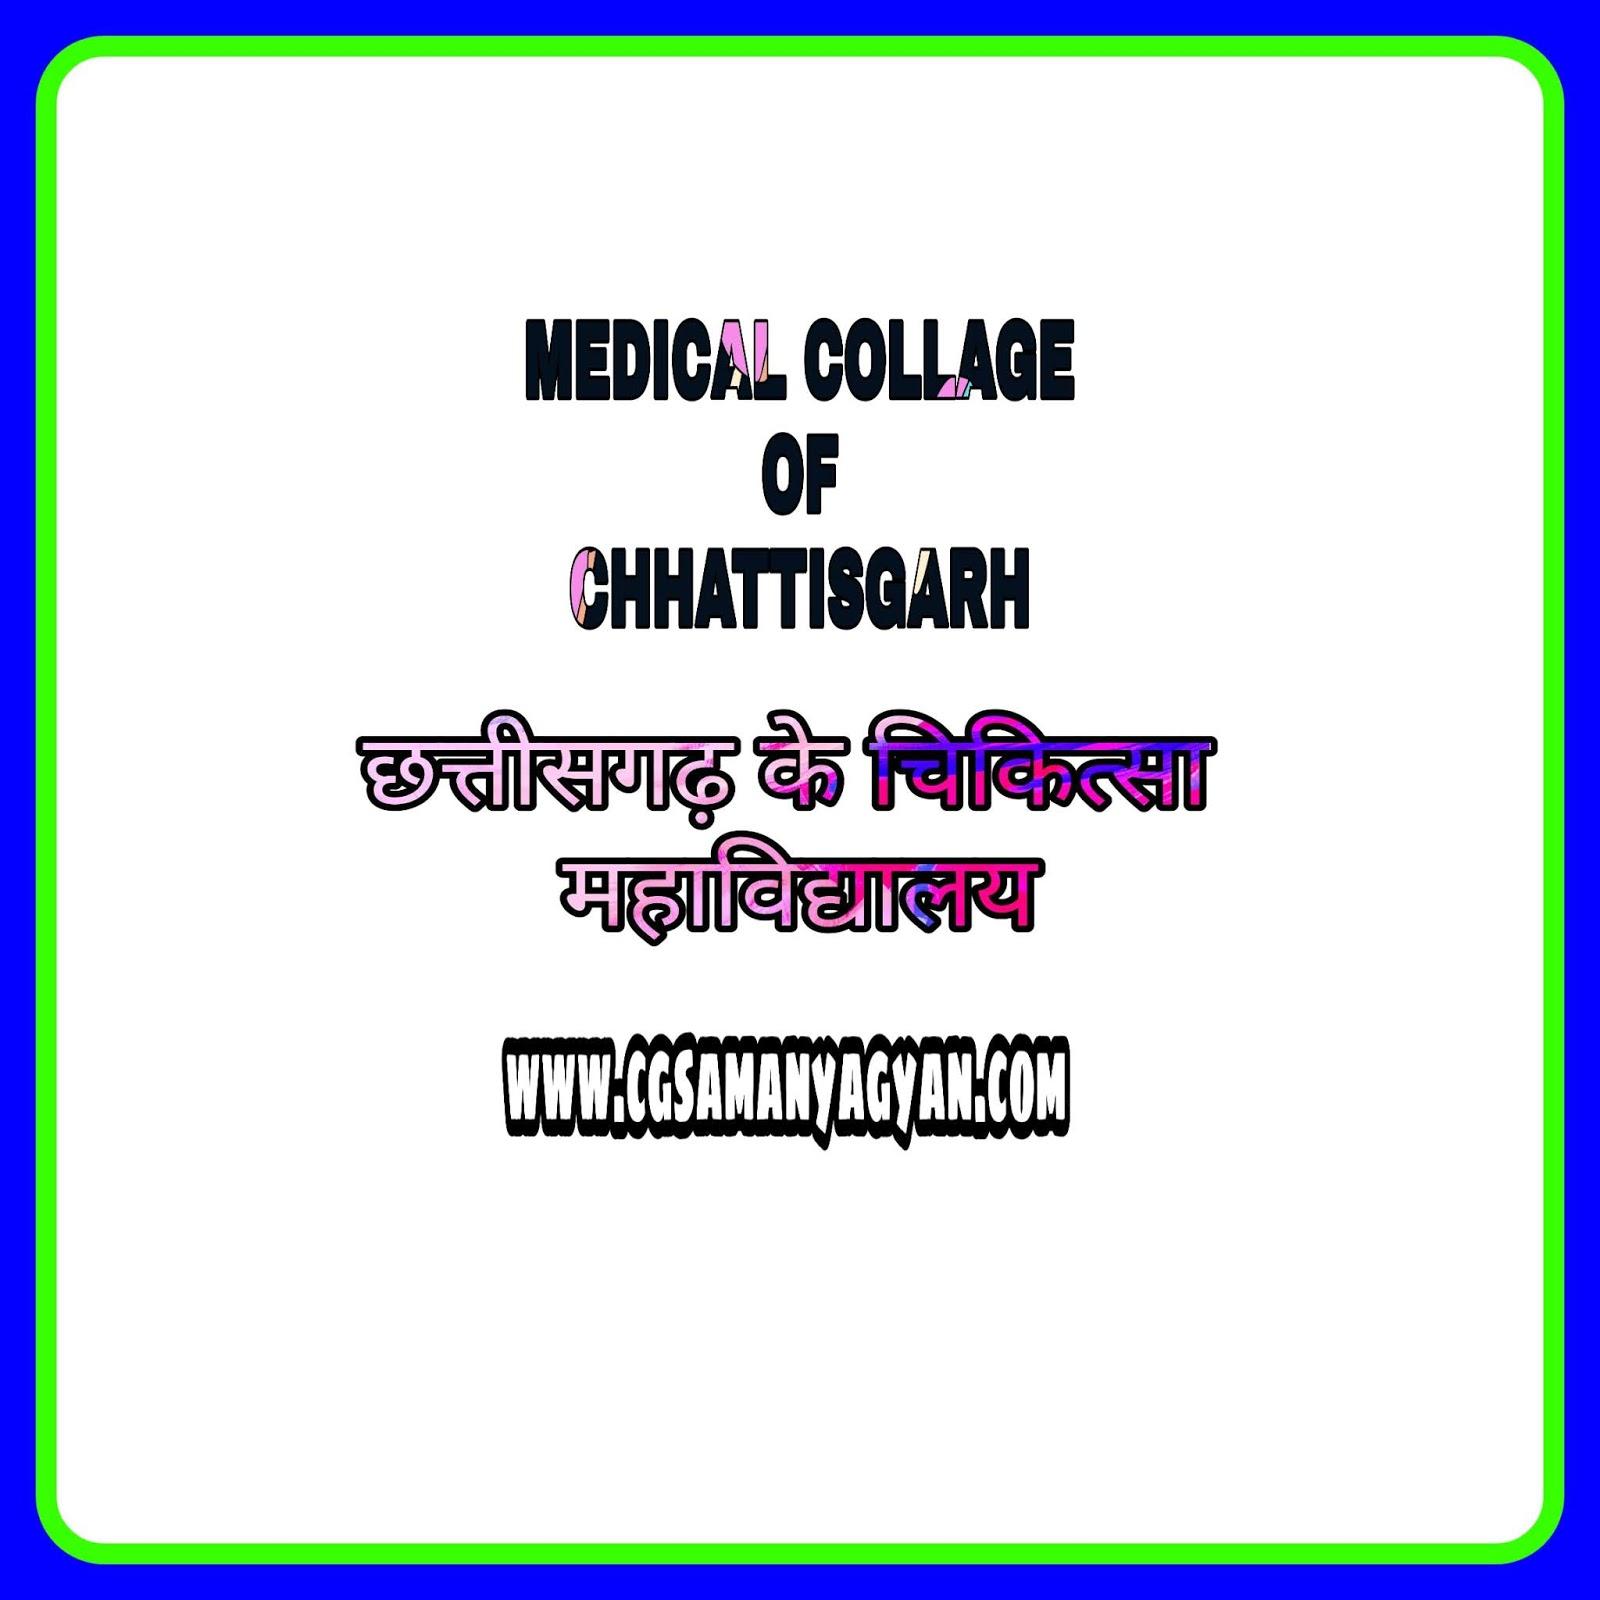 छत्तीसगढ़ के चिकित्सा महाविद्यालय MEDICAL COLLEGE OF CHHATTISGARH